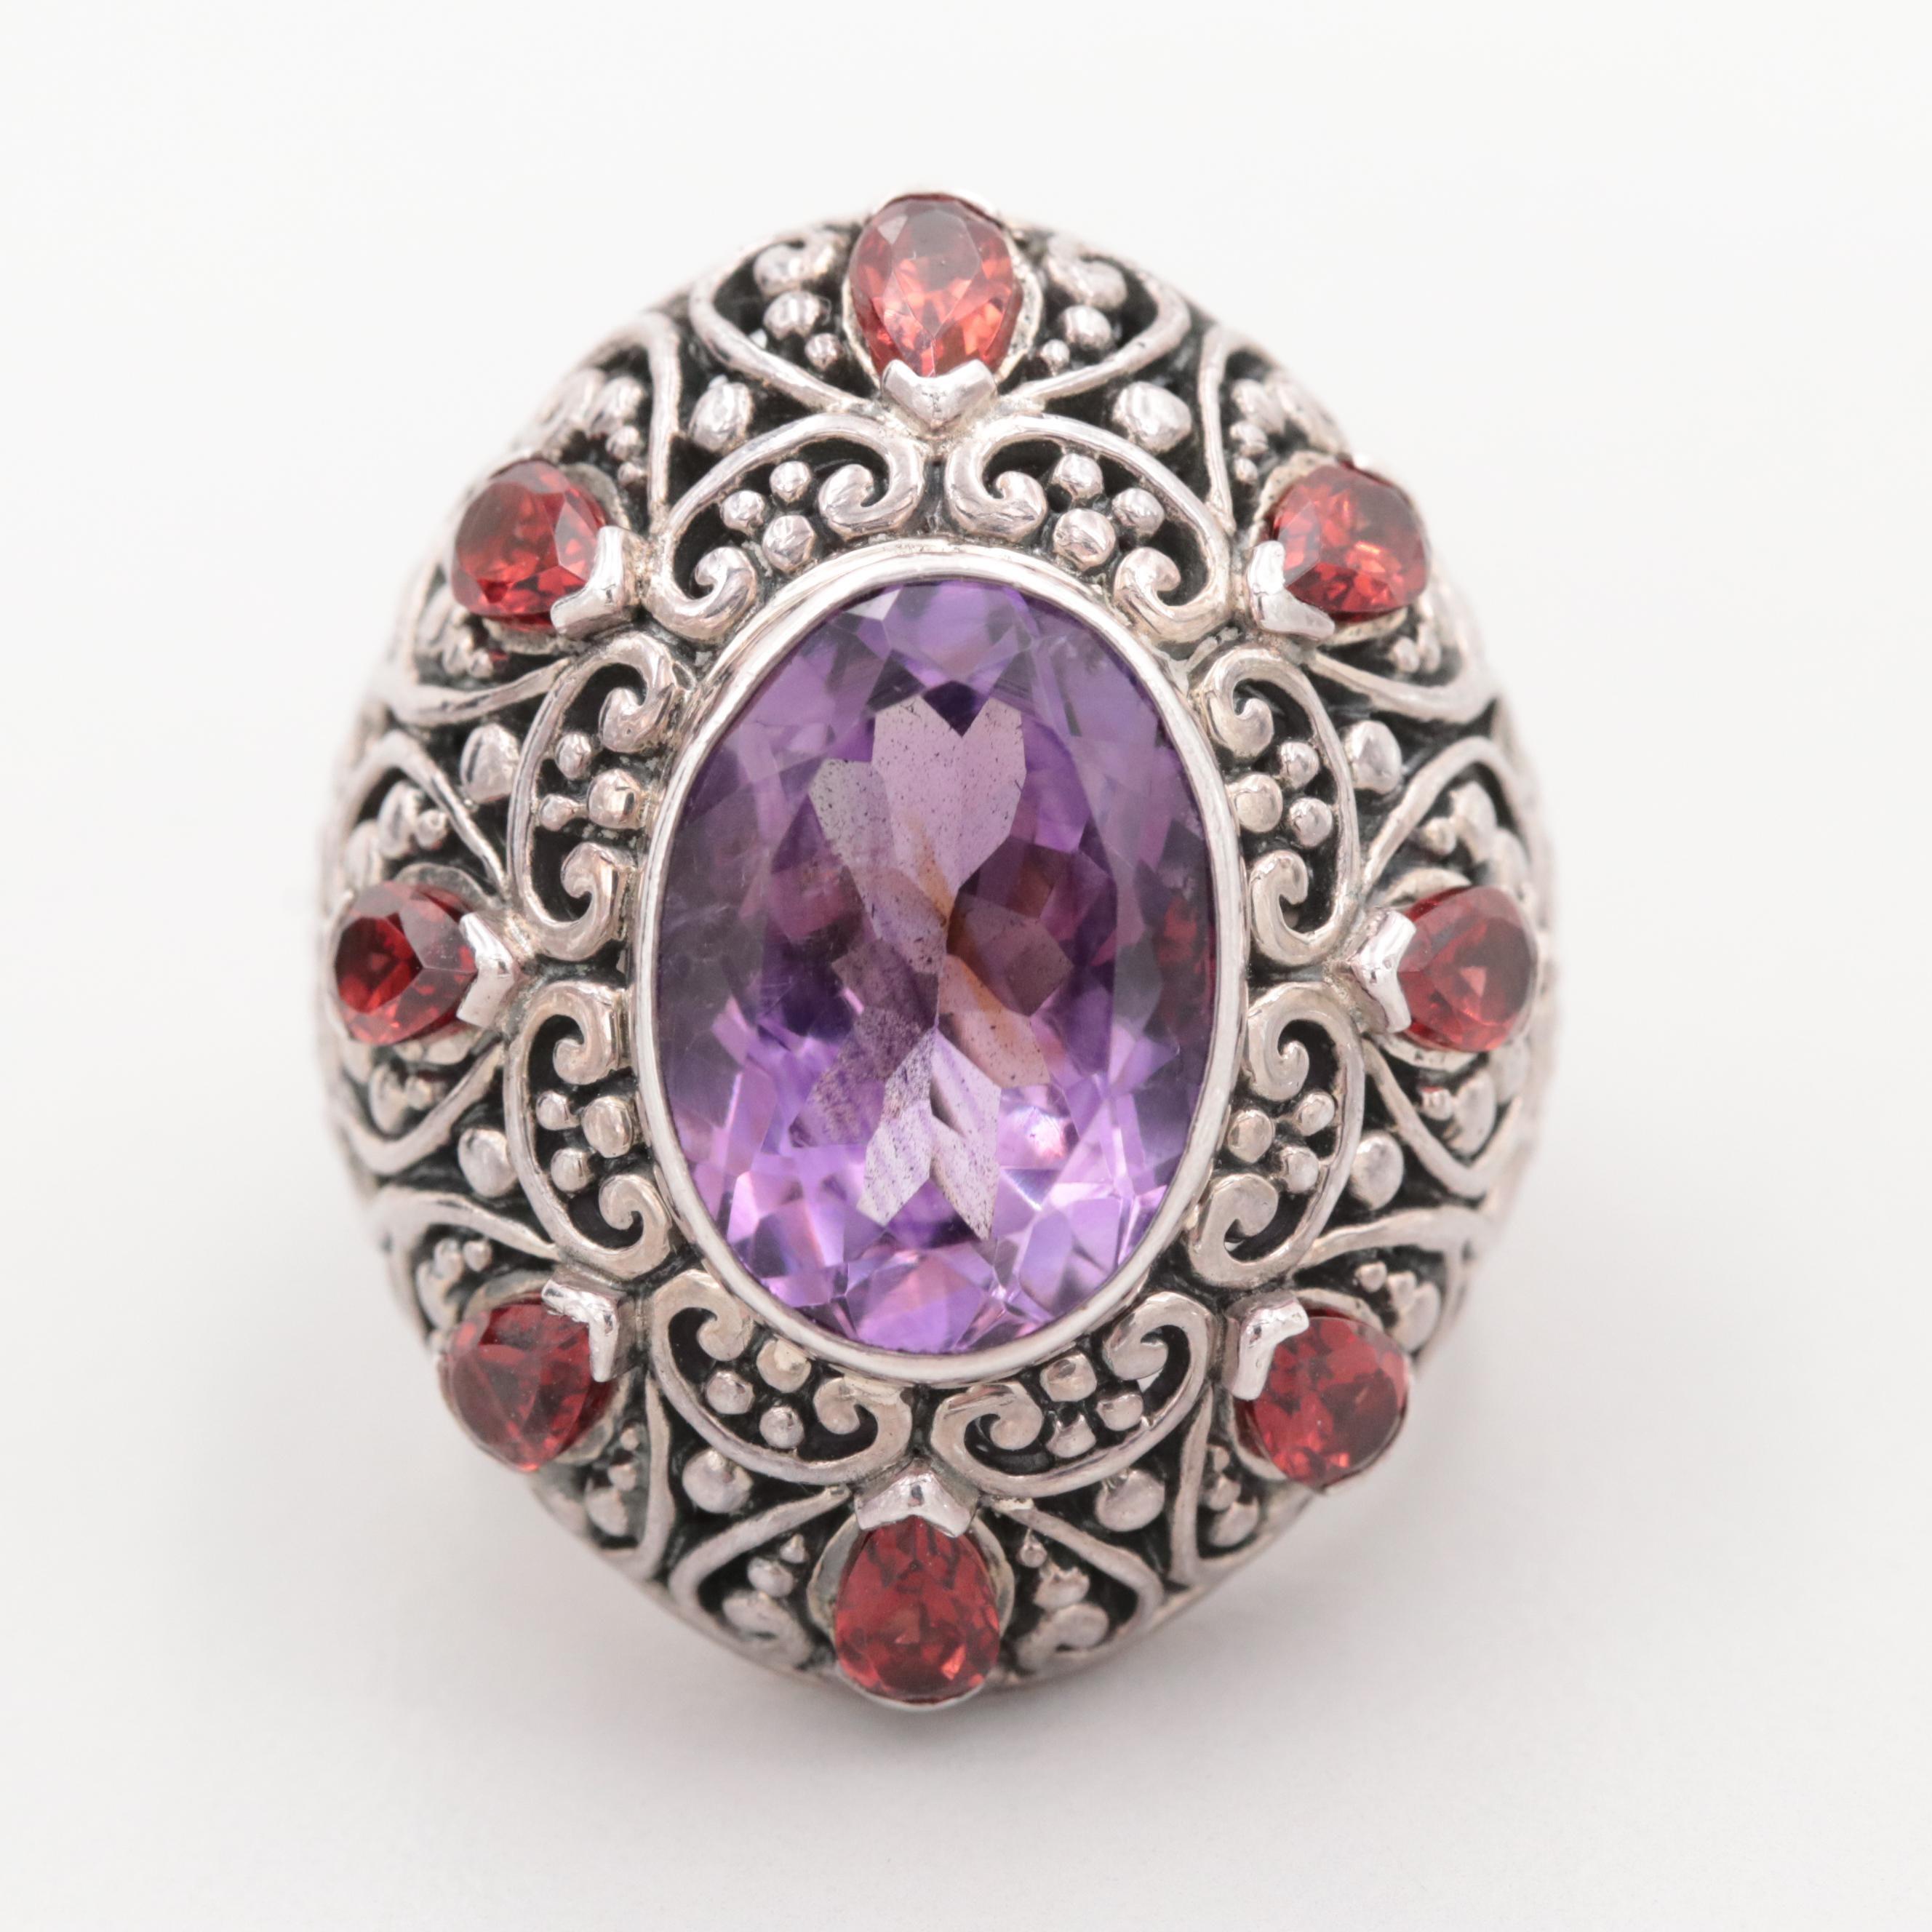 Robert Manse Sterling Silver Amethyst and Garnet Ring